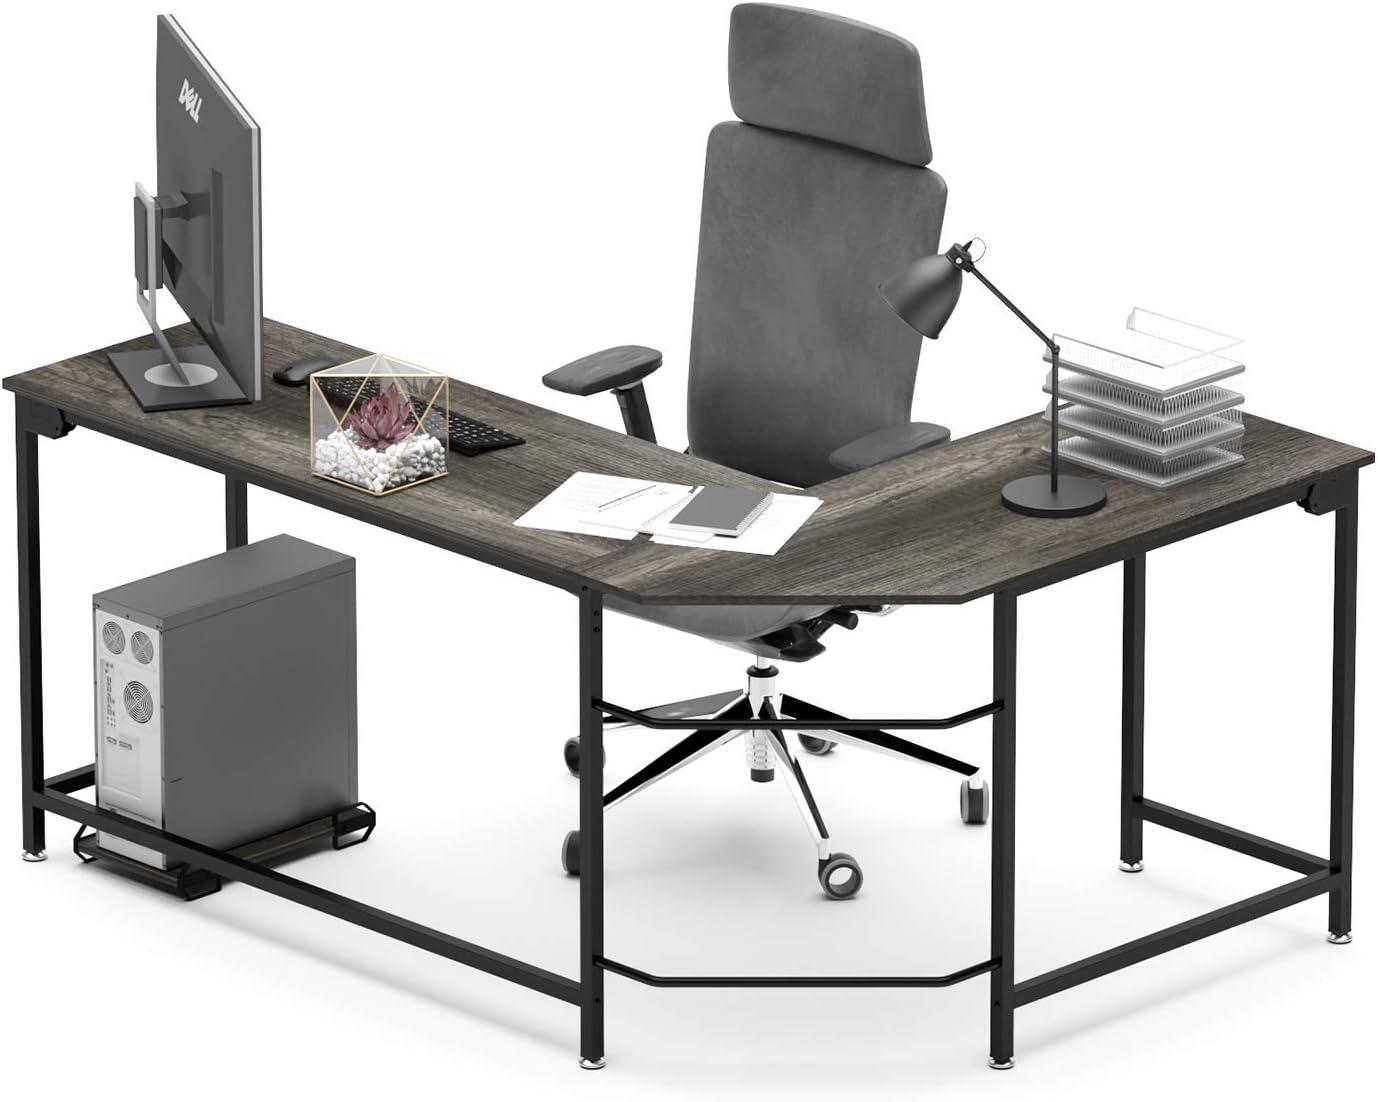 WeeHom L Shaped Desk Corner Gaming Computer Desk Sturdy PC Laptop Table Workstation for Home Office